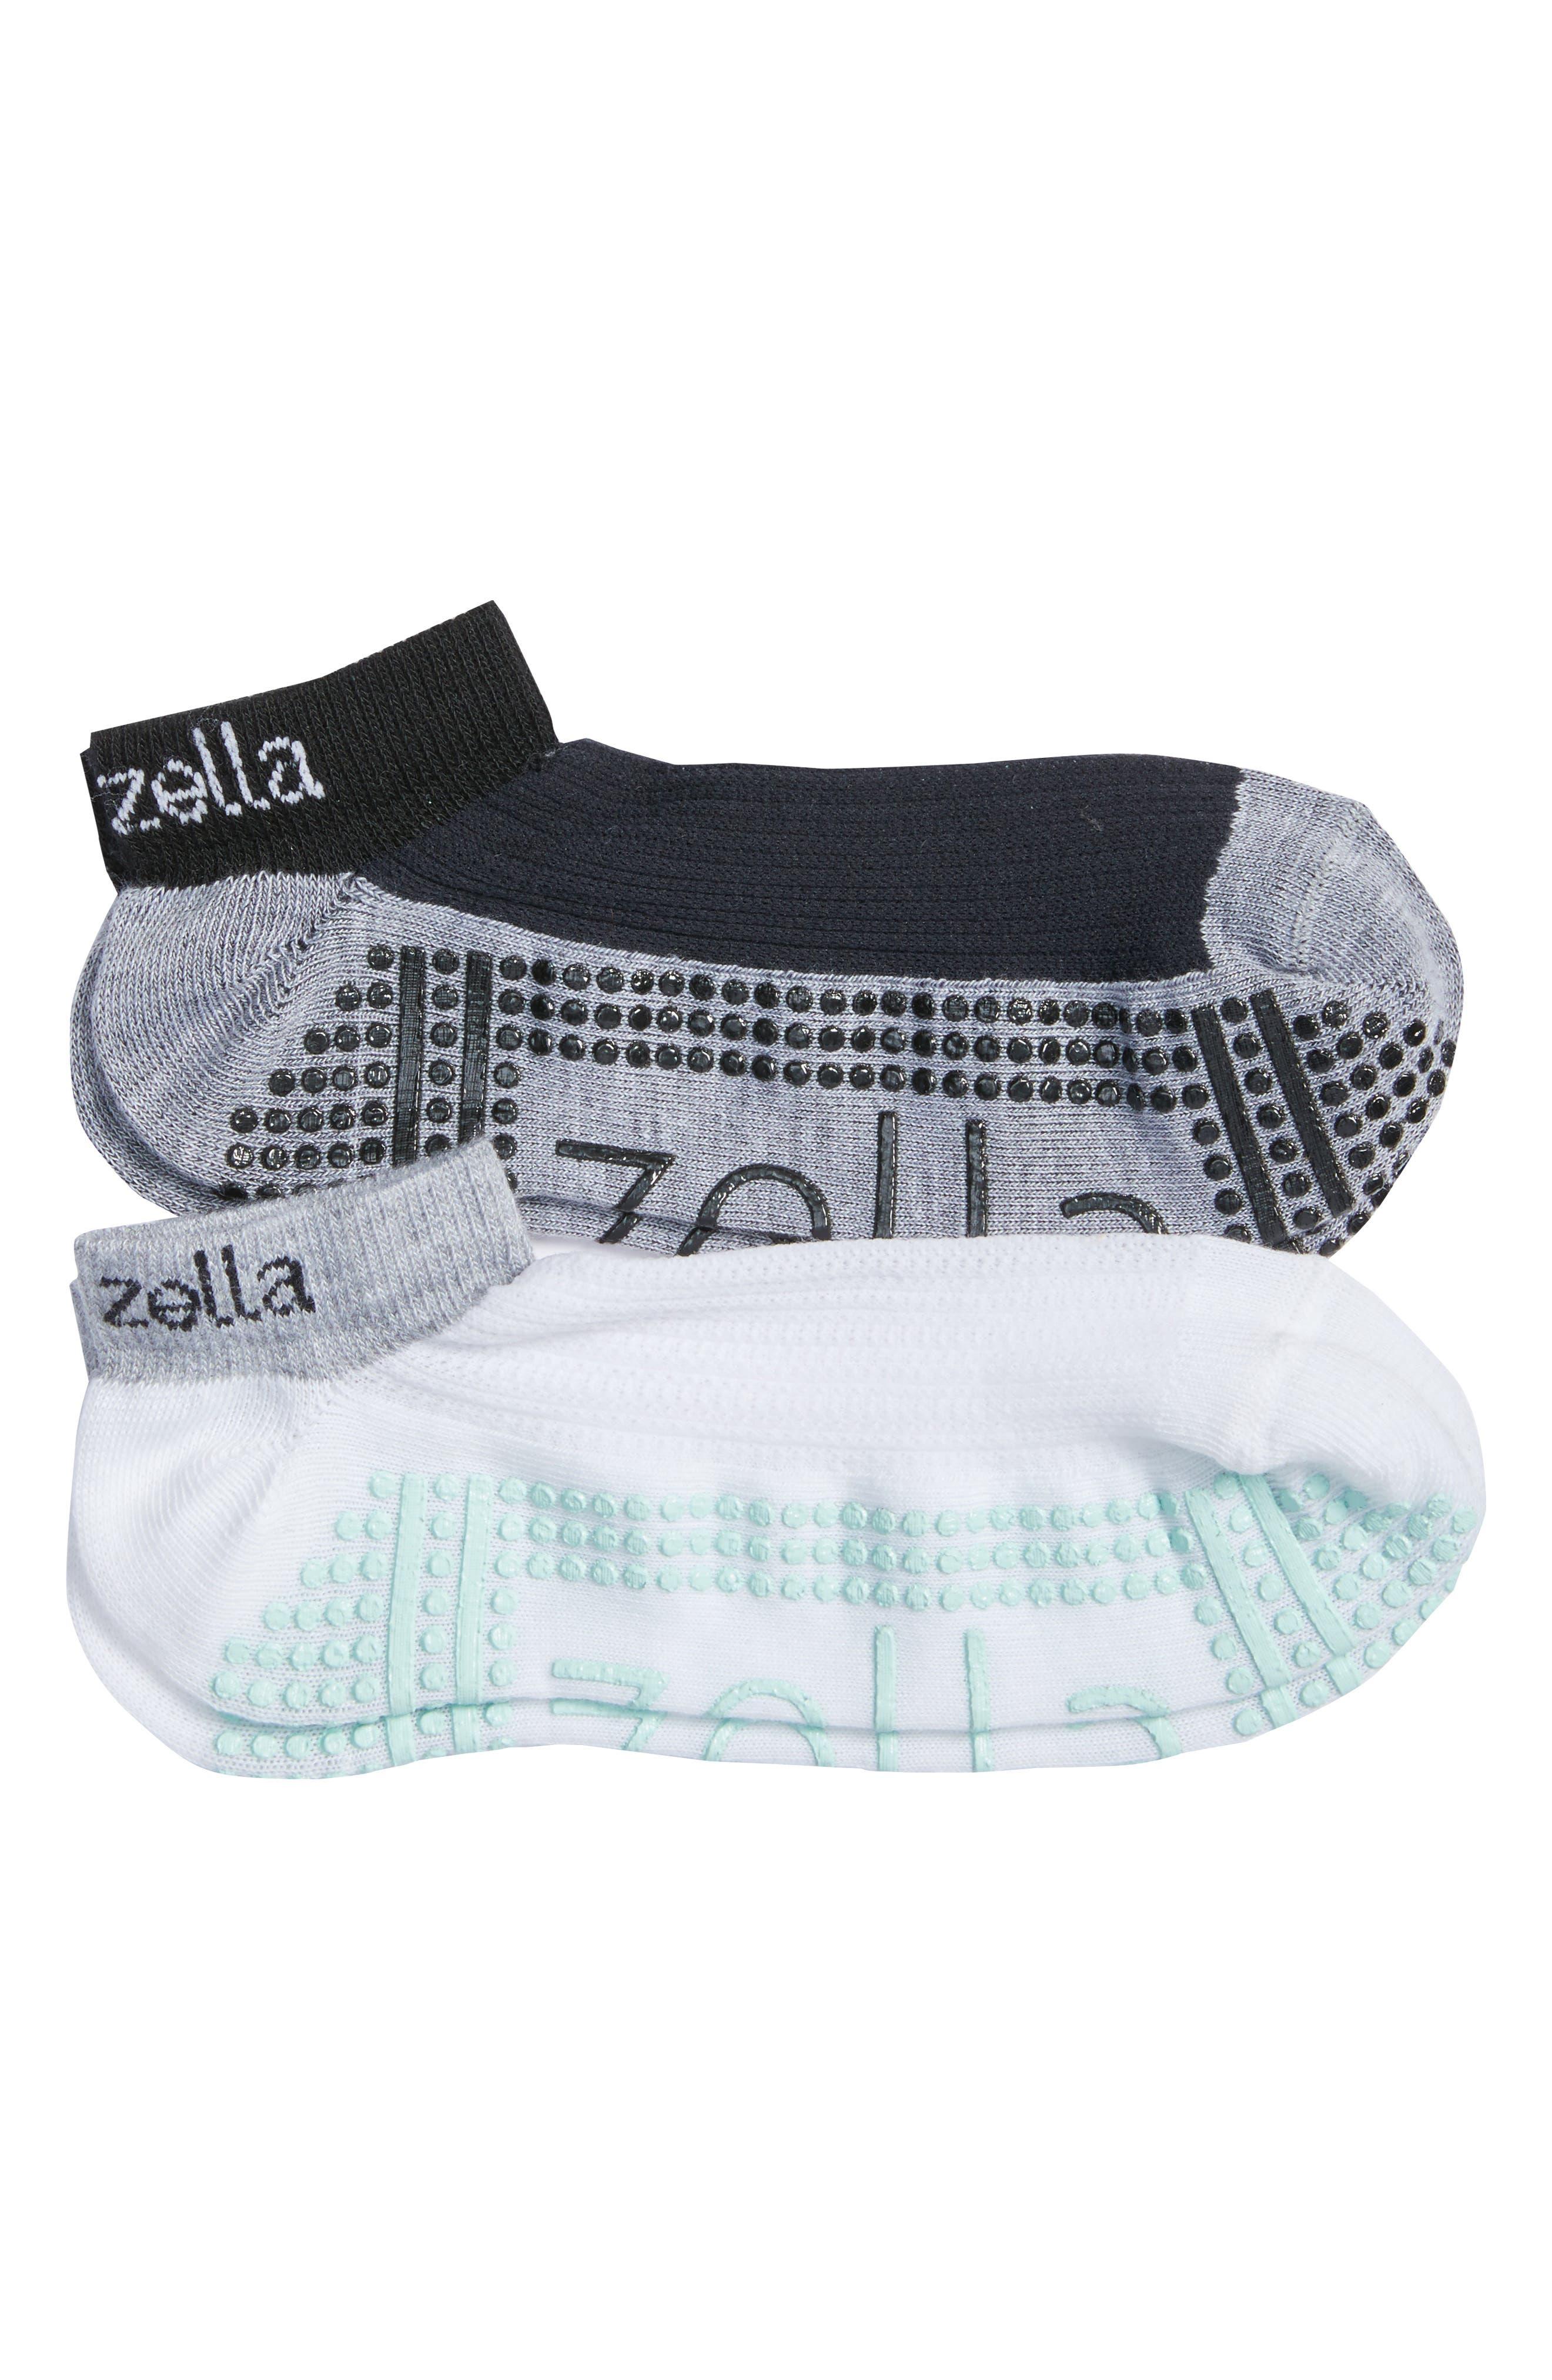 2-Pack Studio Ankle Socks,                         Main,                         color, Grey Wolf Heather/ Teal Surf